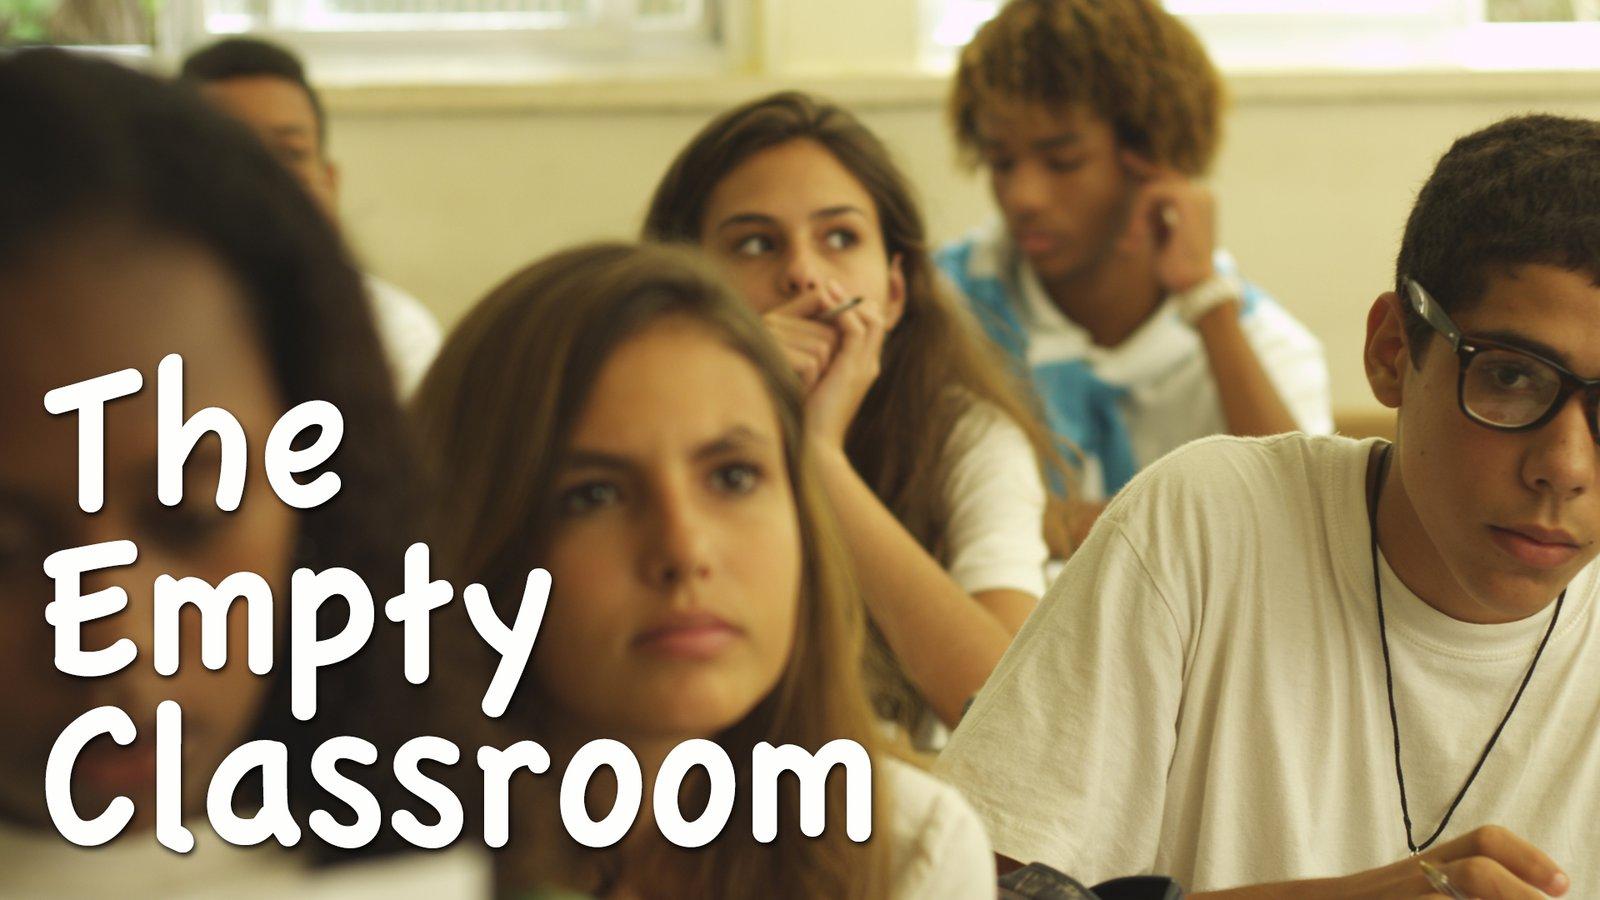 The Empty Classroom (El aula vacía) - Short Films on the Latin American Education Crisis